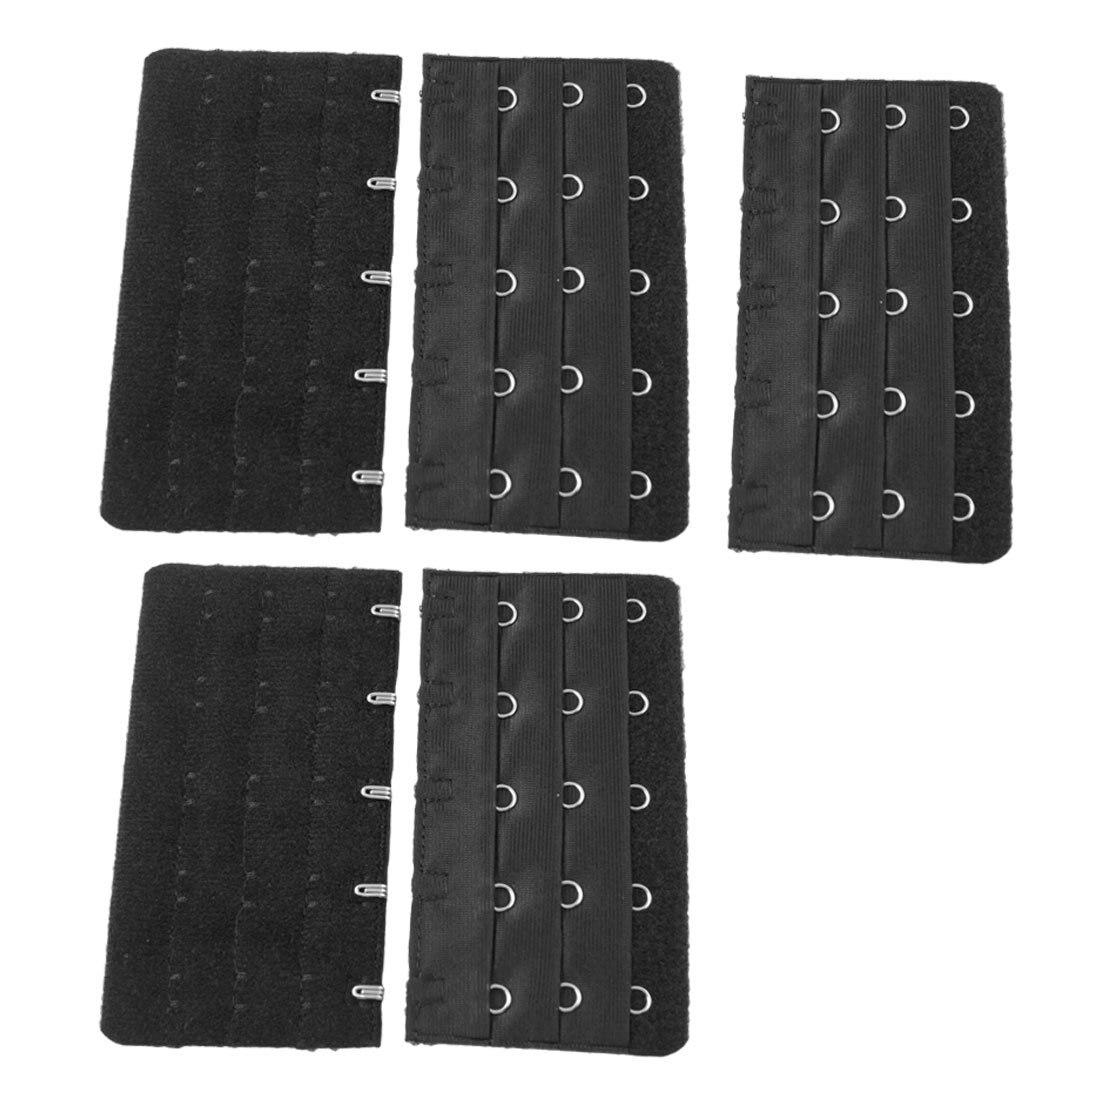 MOCH Black 5 Rows Hook and Eye Tape Extension Bra Strap Extender 5 Pcs for Women